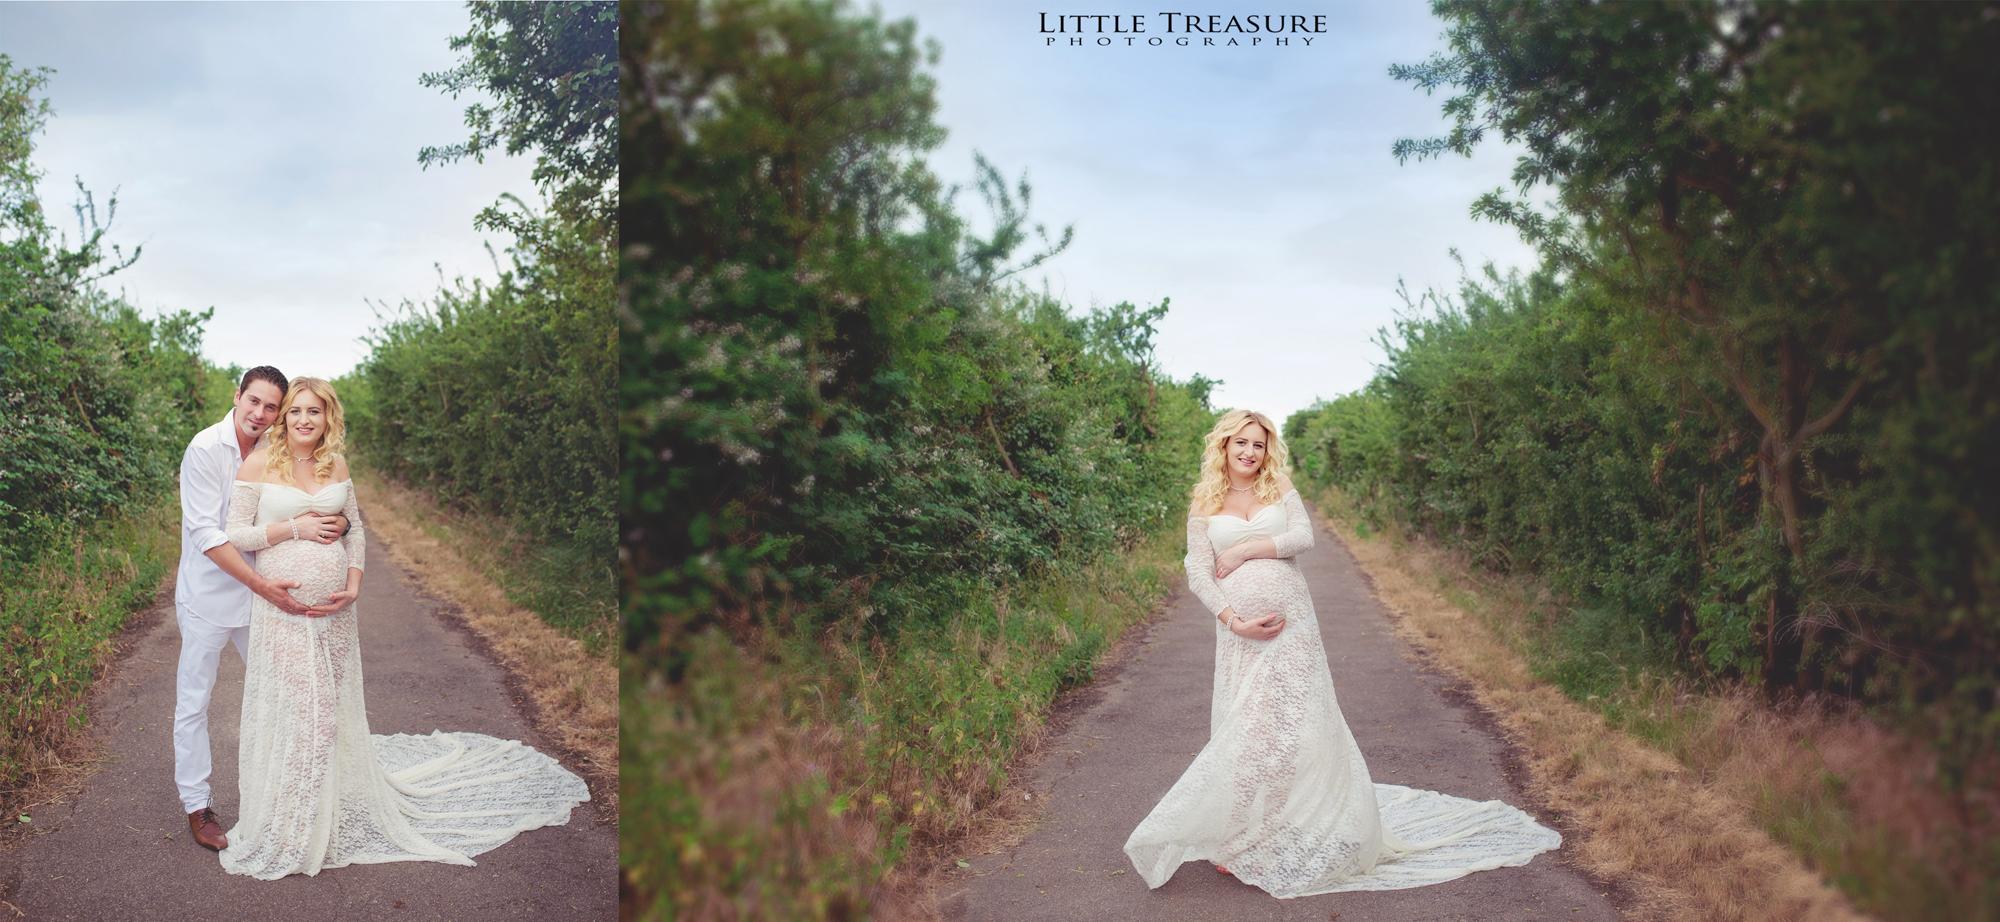 Essex Fanily Photographer